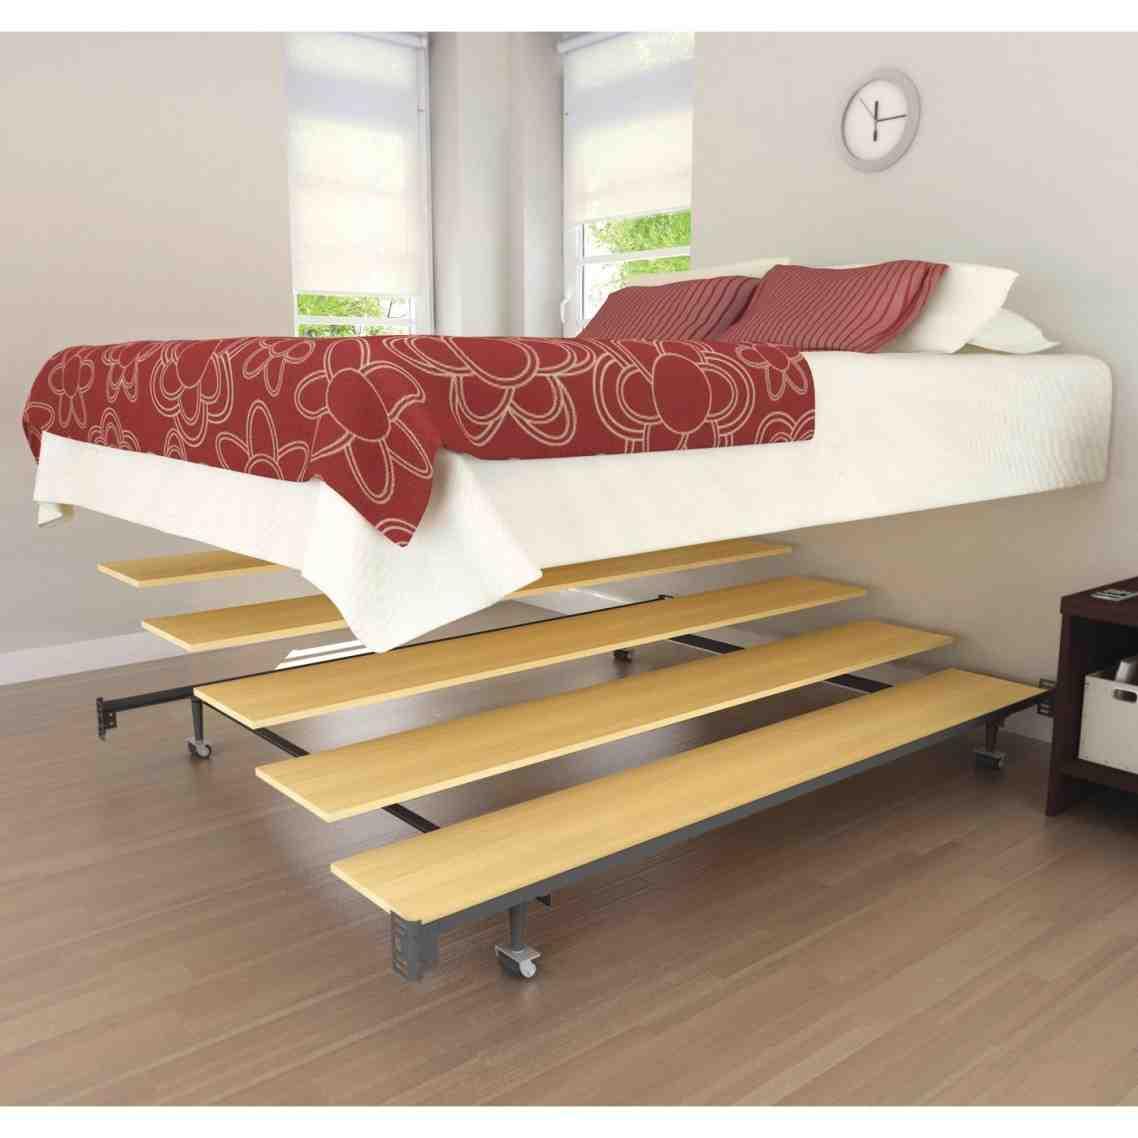 Full Size Adjustable Bed Frame - Decor IdeasDecor Ideas